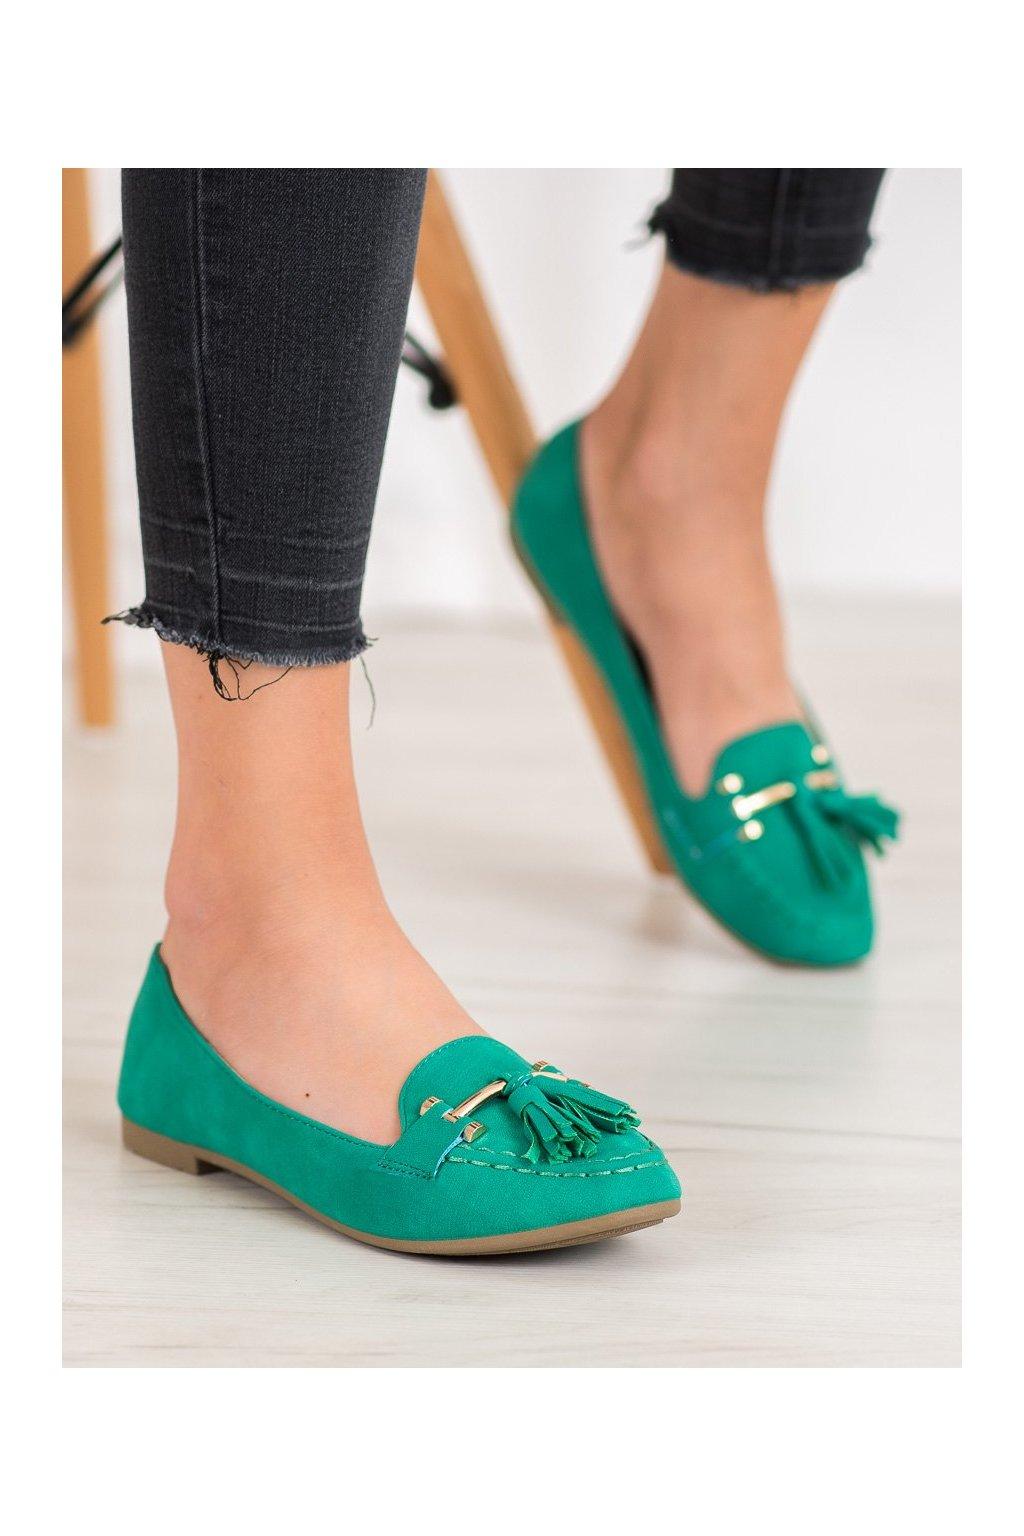 Zelené topánky Nio nio kod 99-08A-GR